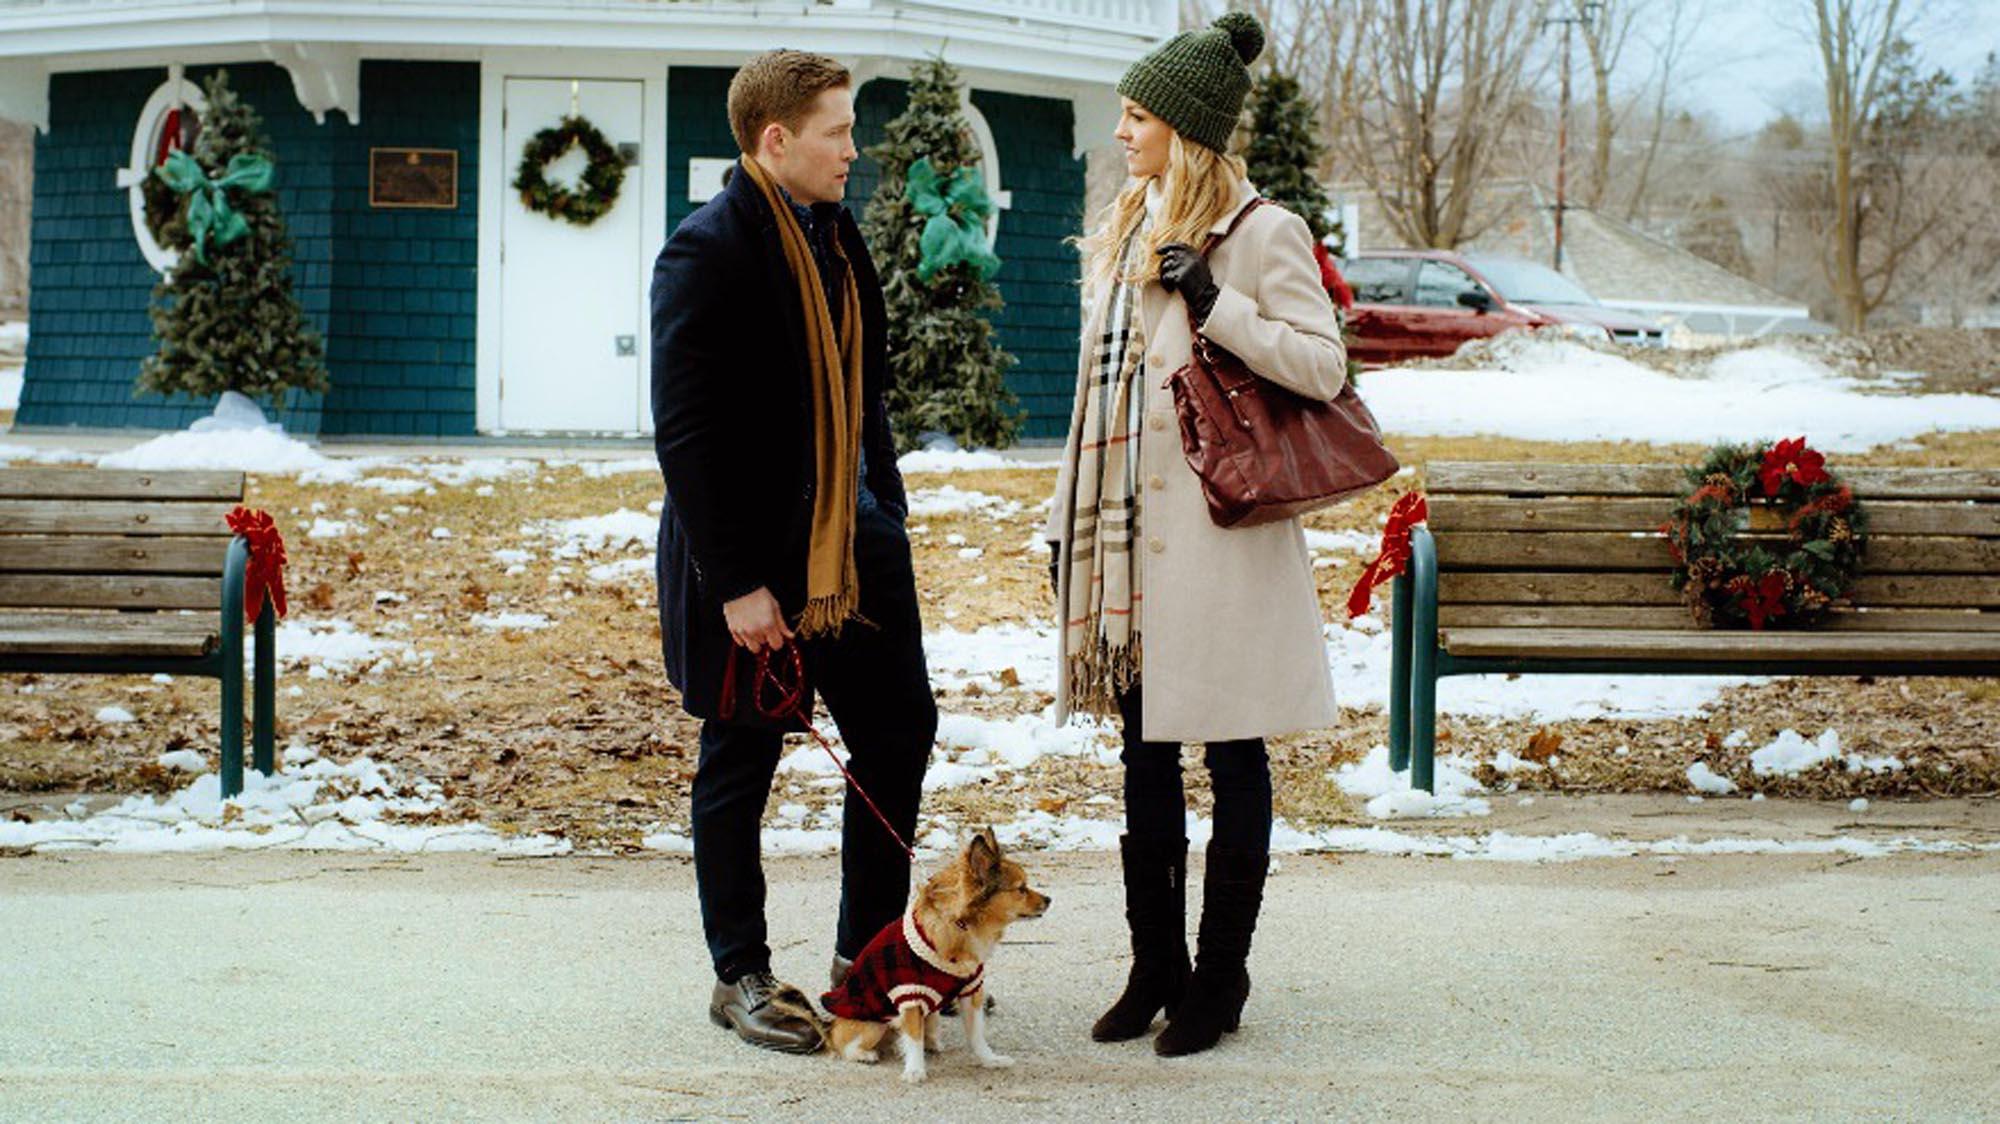 2021 Lifetime Christmas Movies - Christmas by Chance